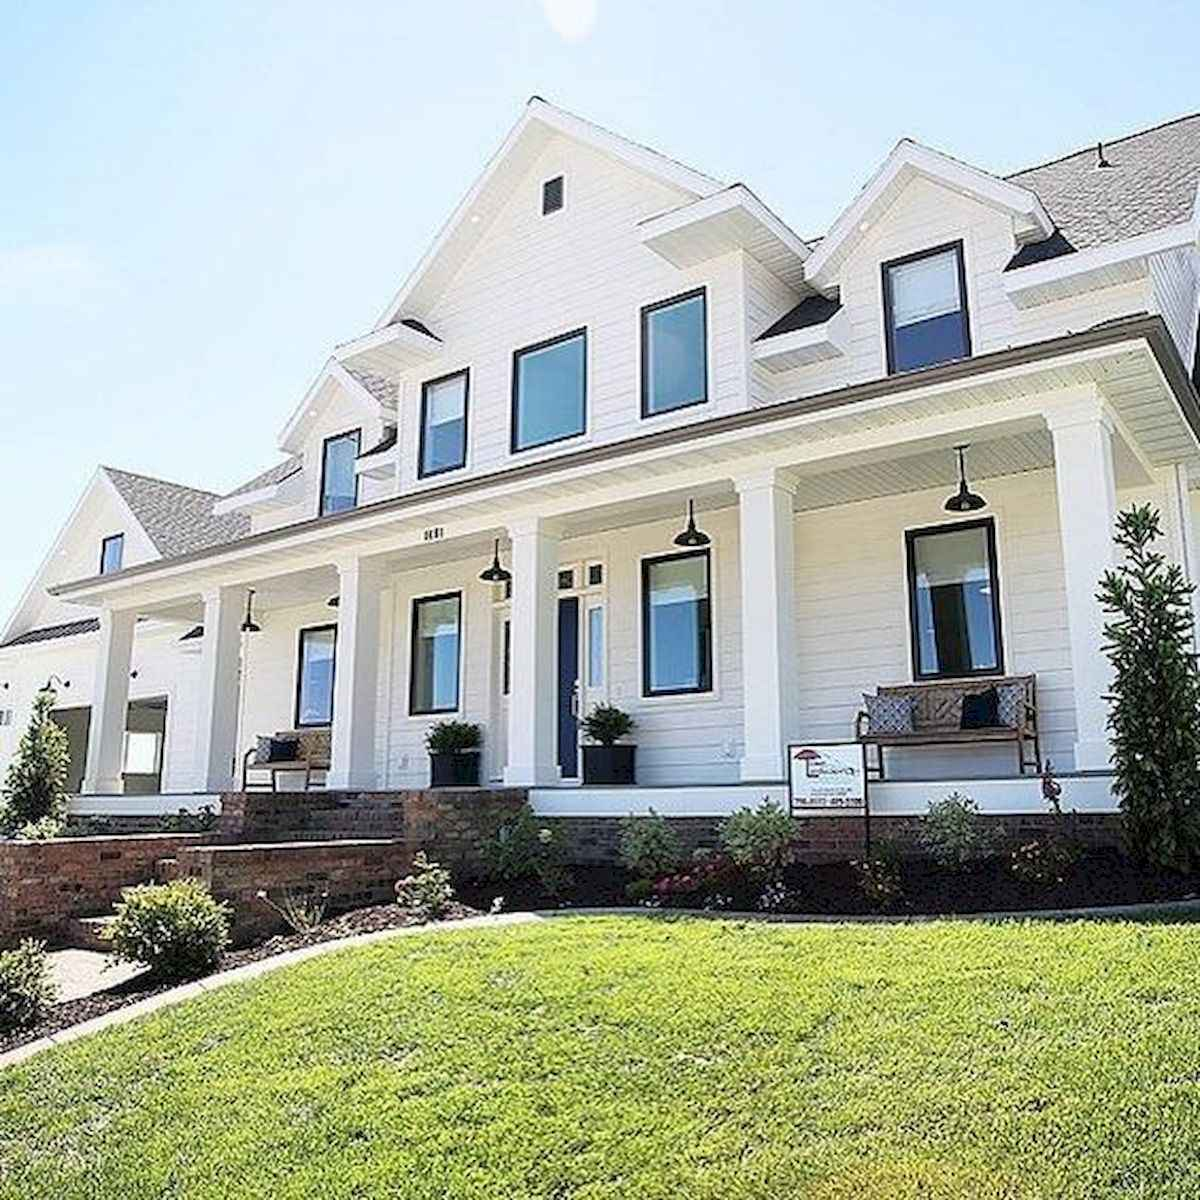 40 Fantastic Dream Home Exterior Design Ideas (20)